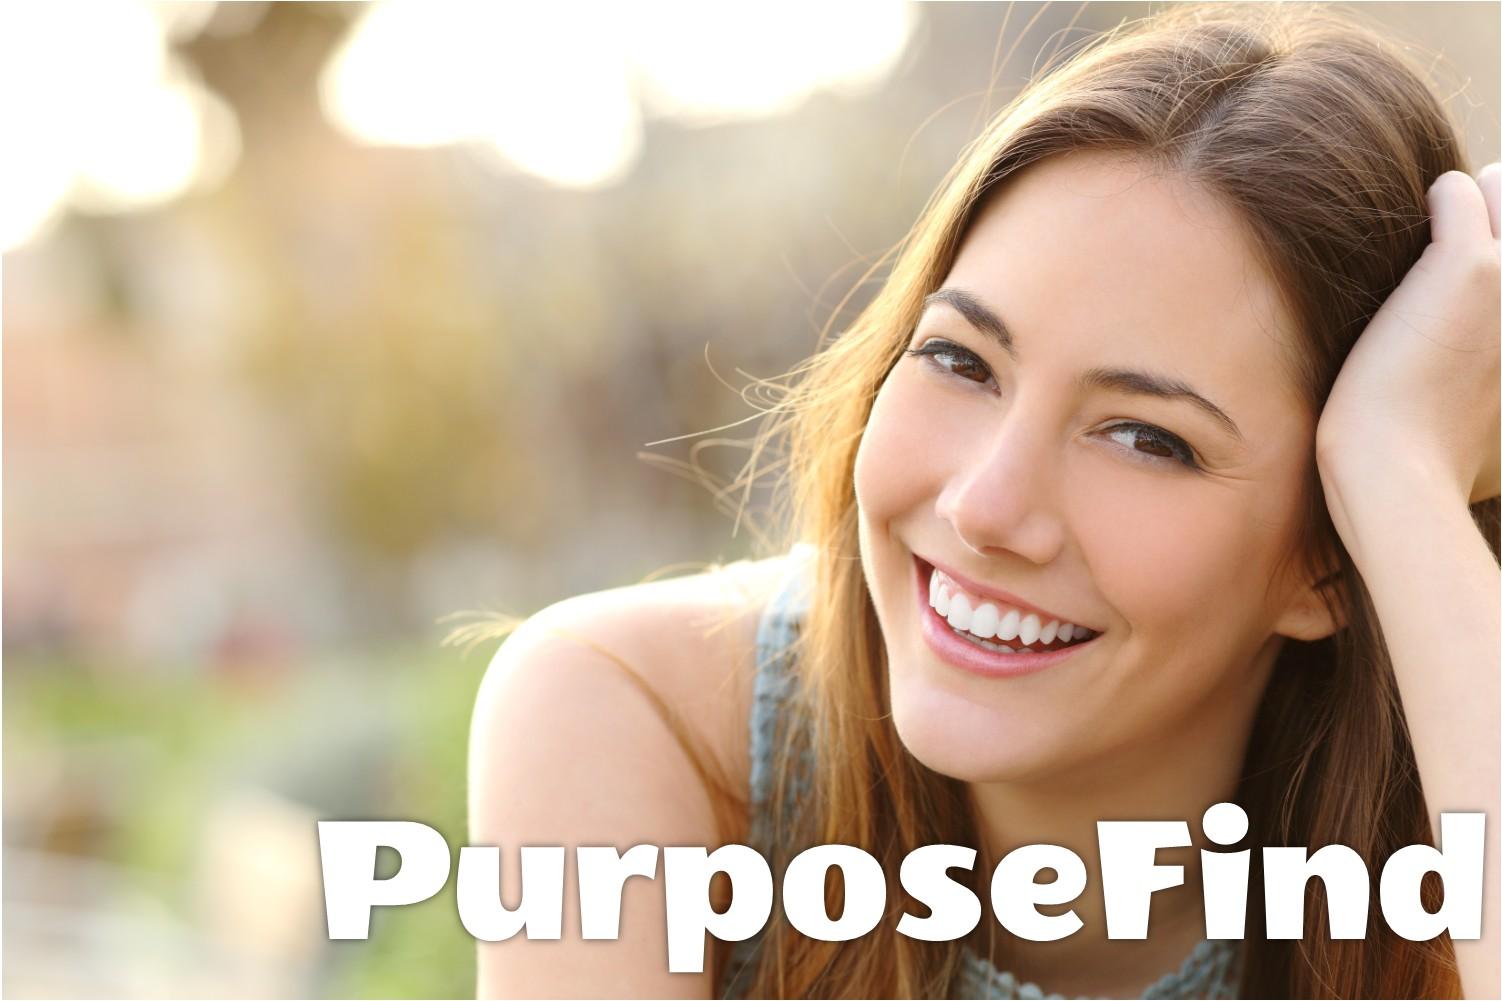 PurposeFind